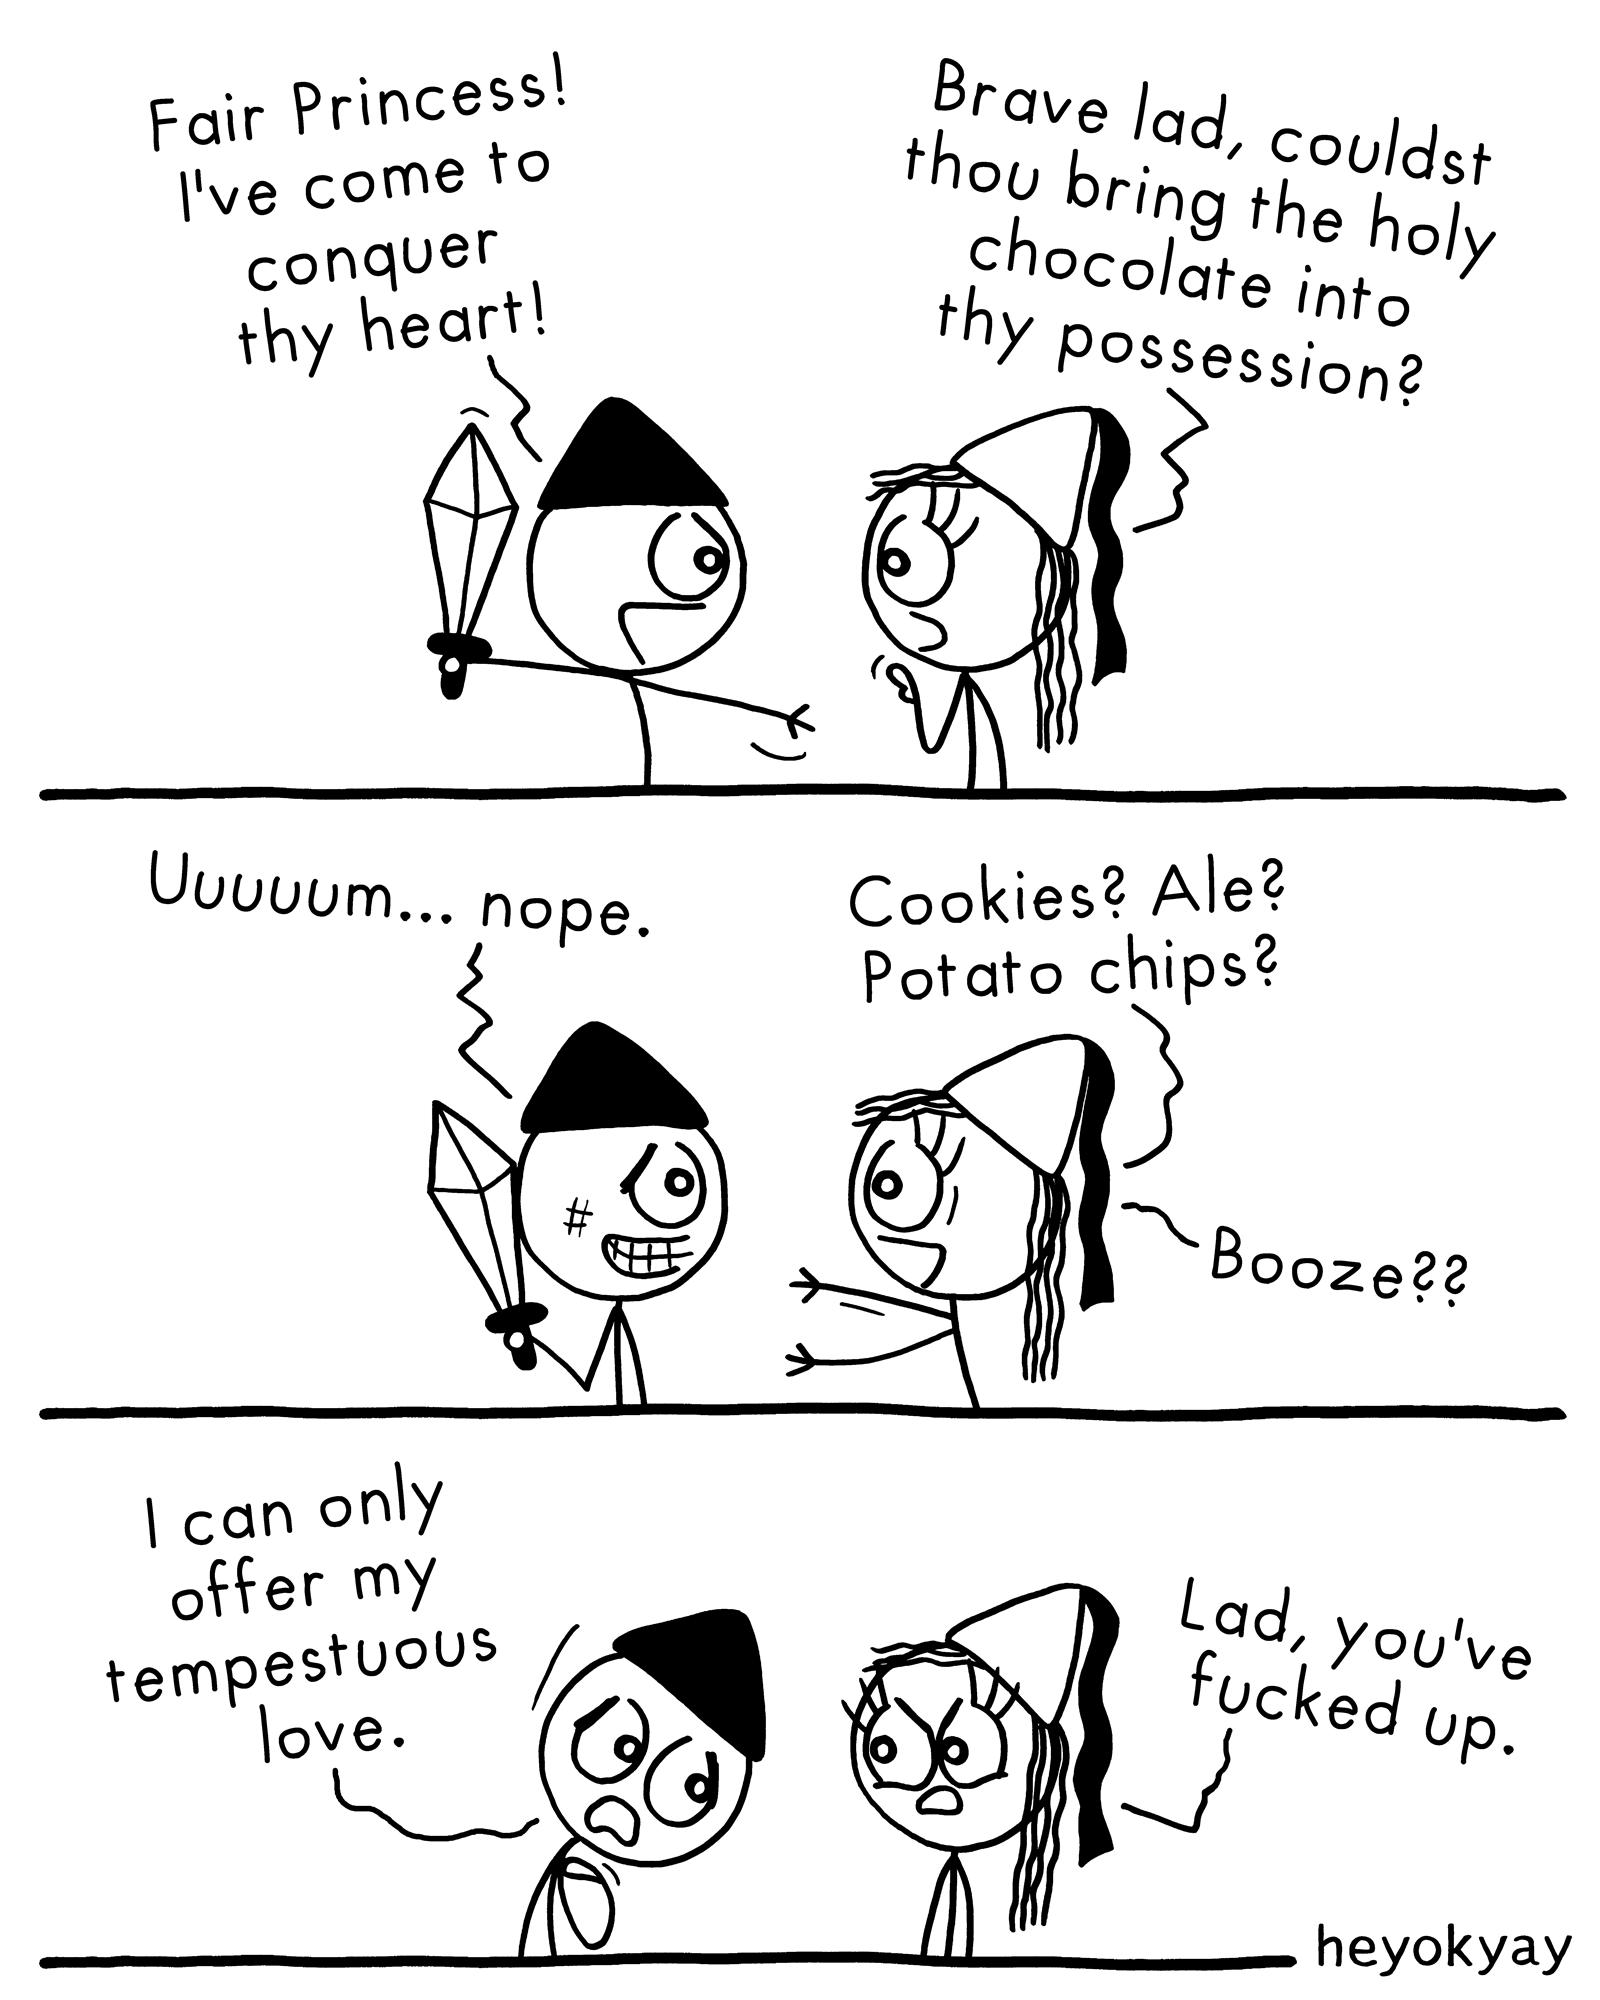 Conquest heyokyay comic